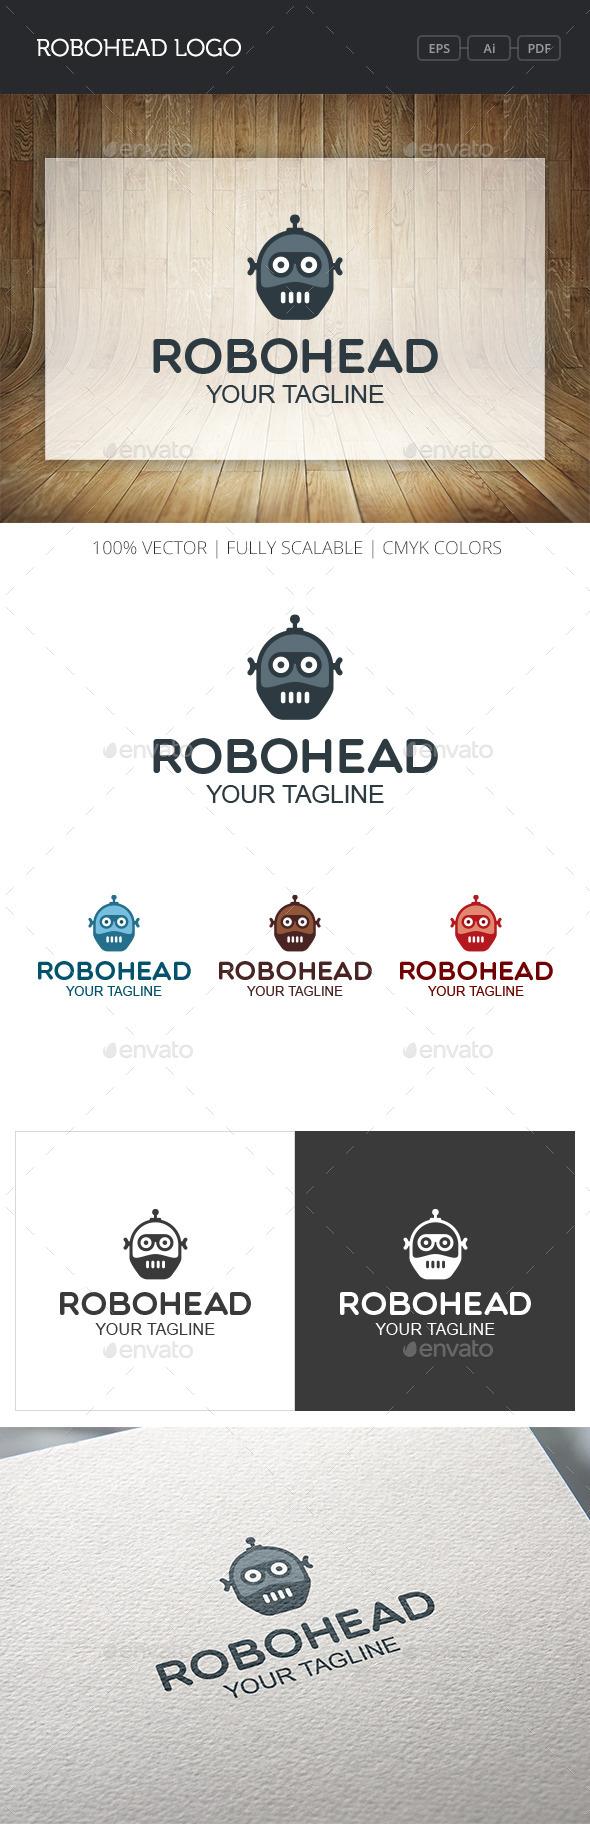 GraphicRiver Robohead Logo 10870246